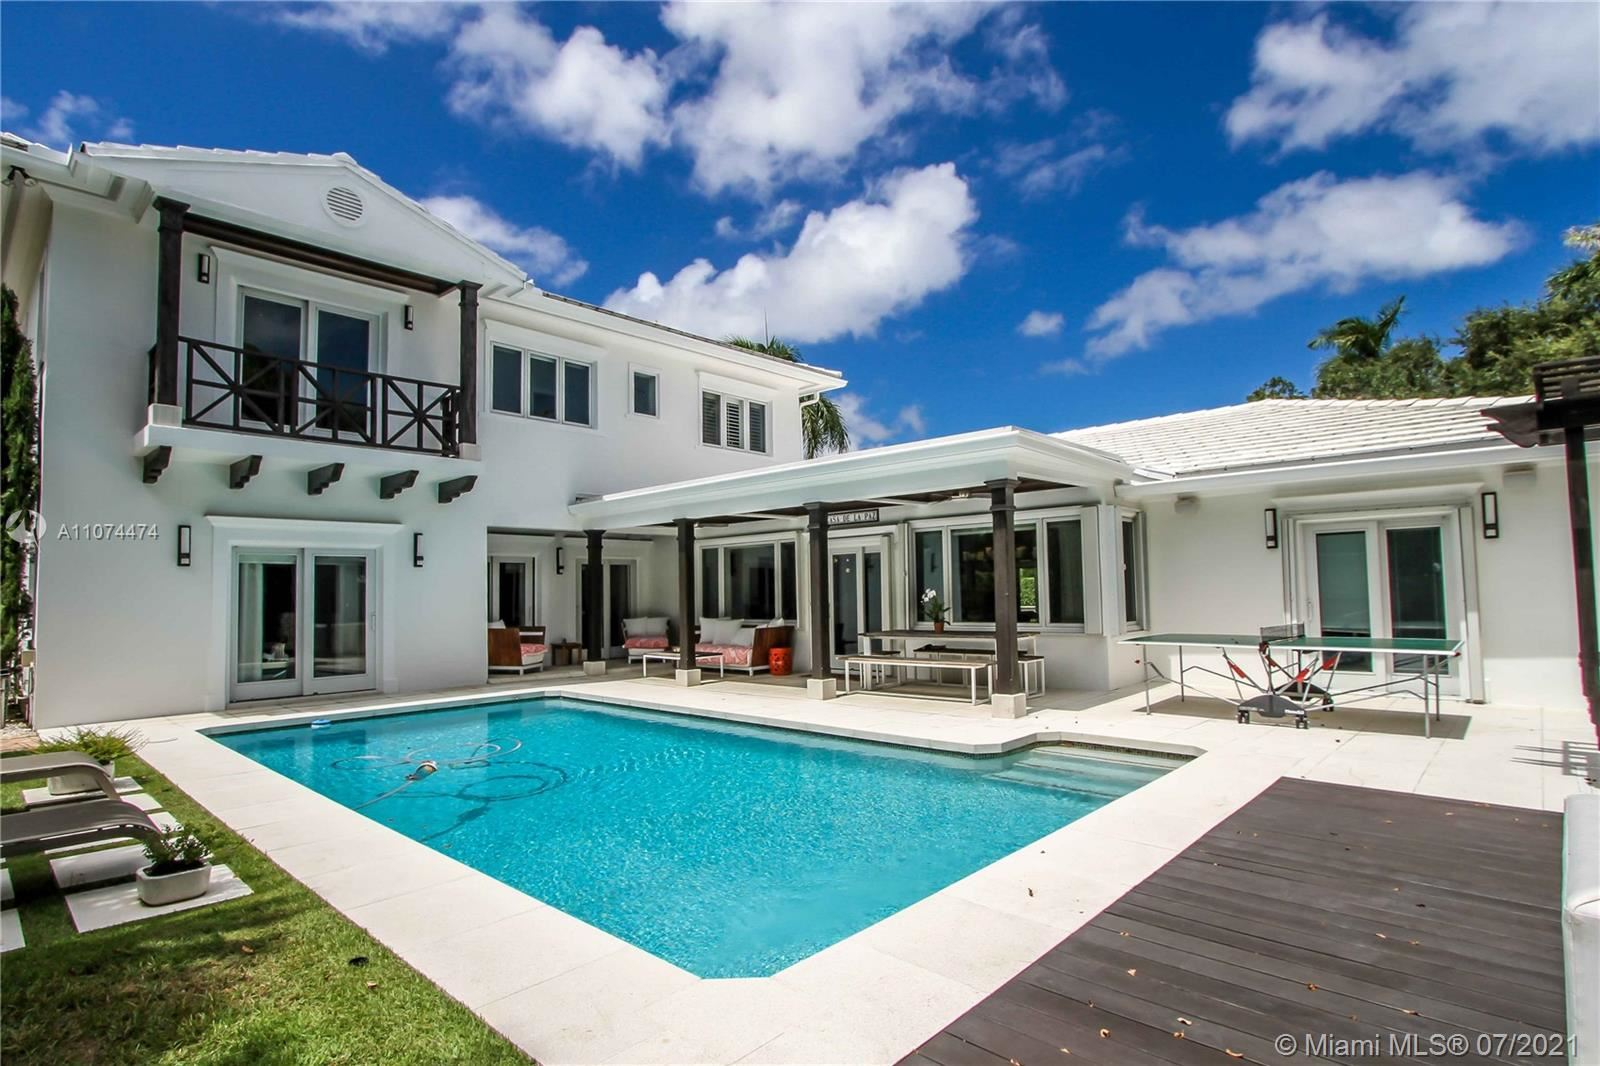 1250 Monroe St, Hollywood, FL 33019 - #: A11074474